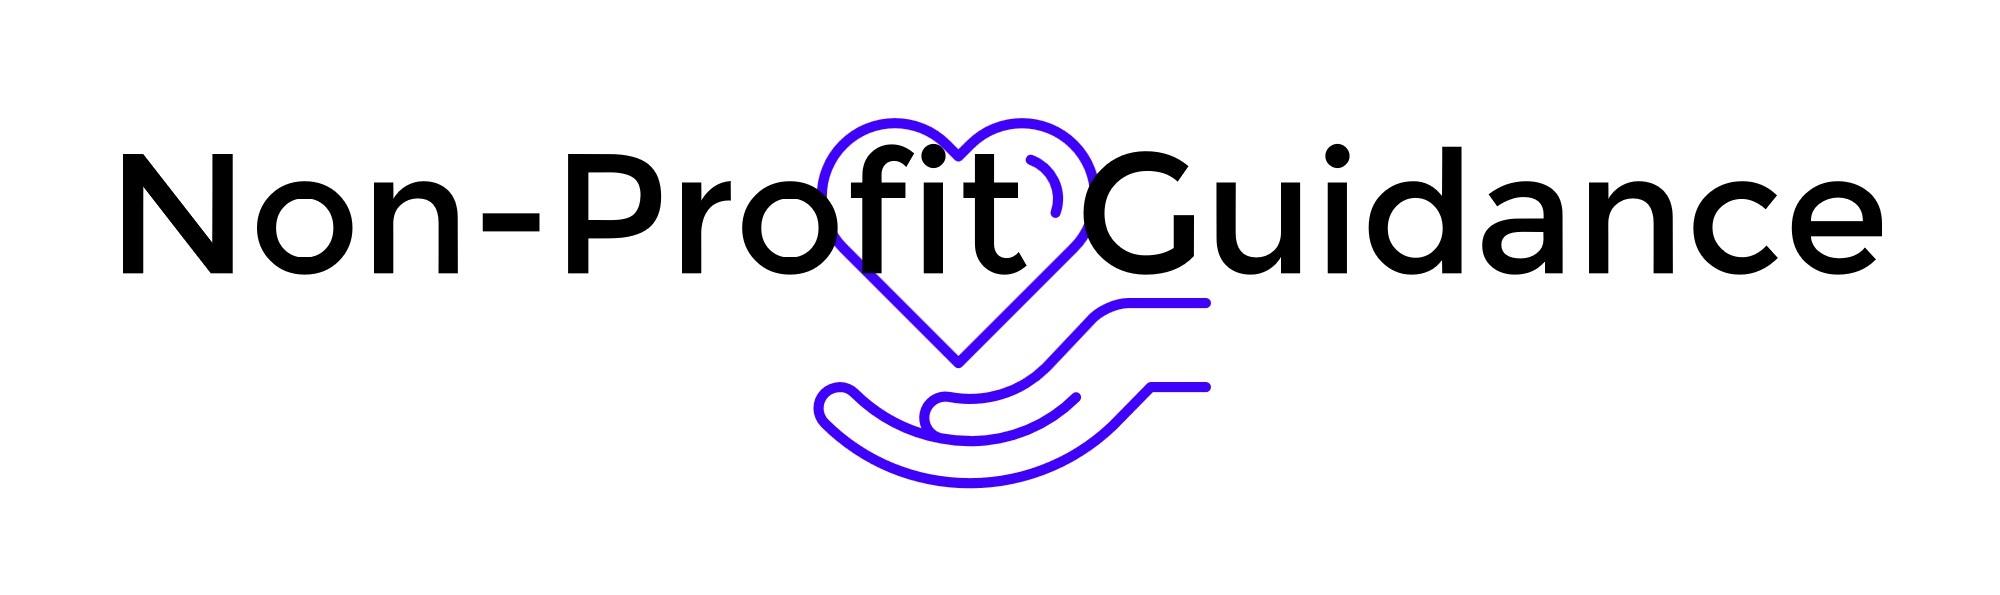 Non-Profit Guidance-logo - jpeg on transparency.jpg